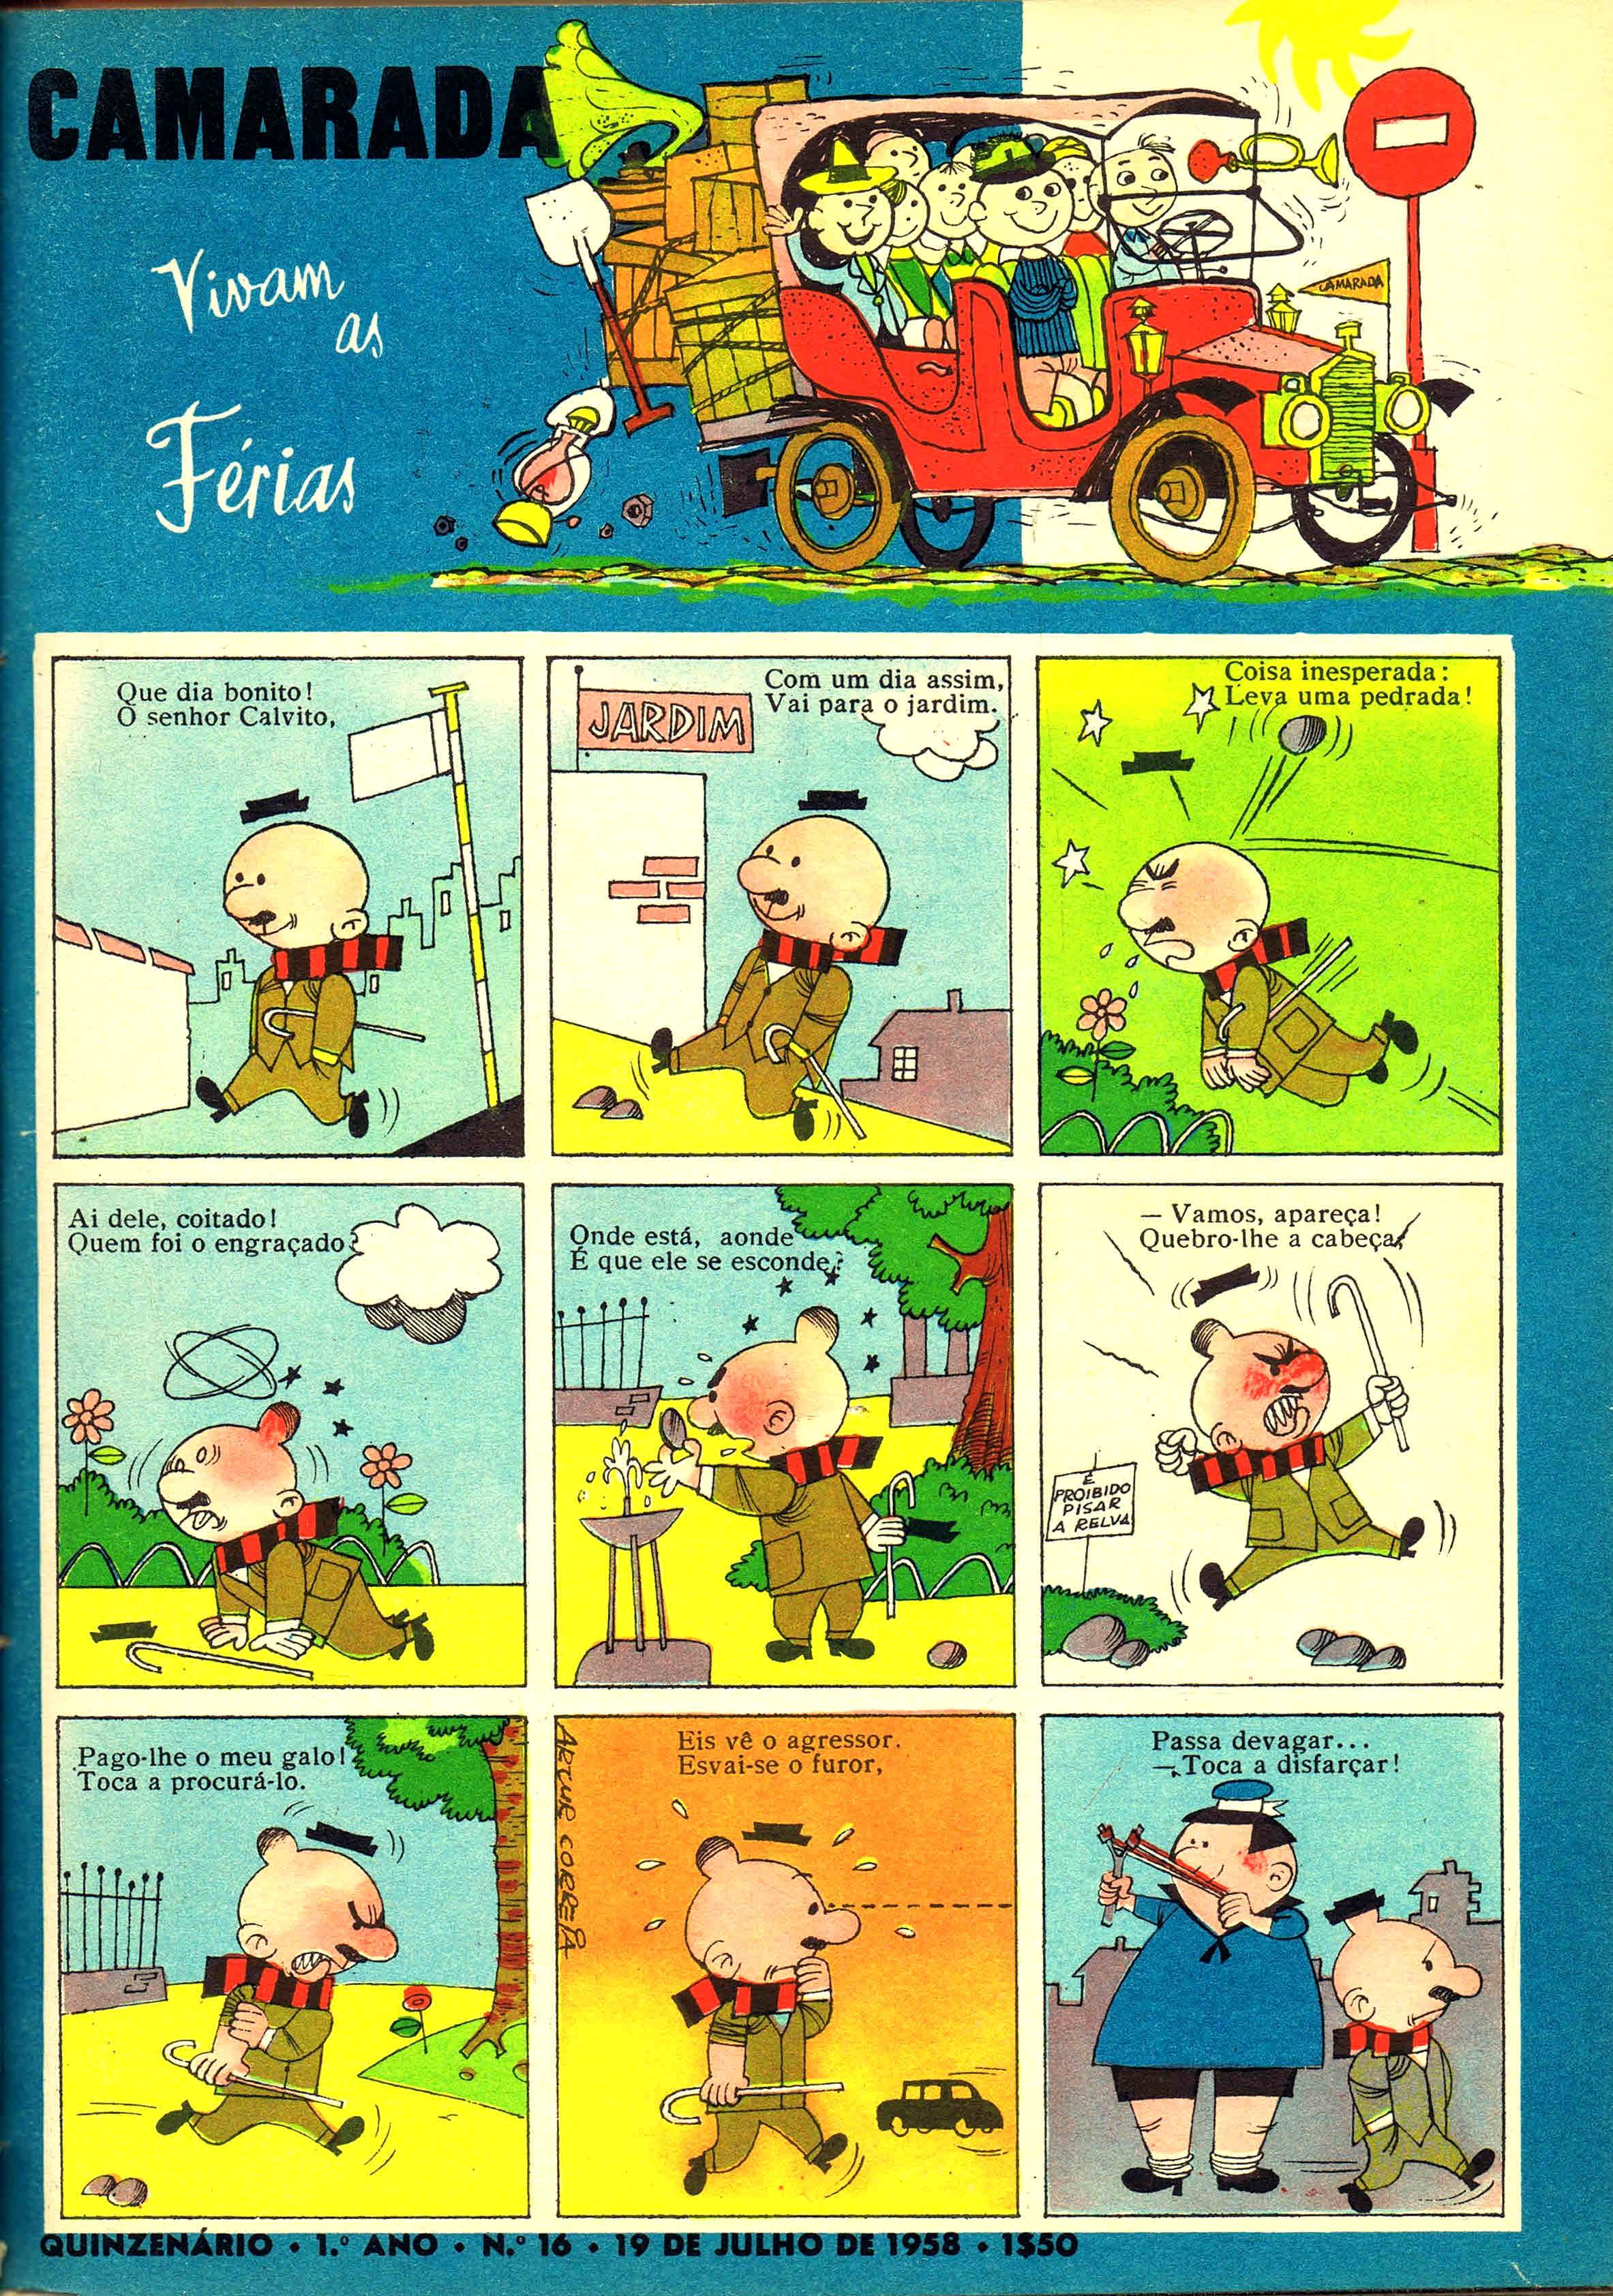 camarada mocidade portuguesa nº 16 1958